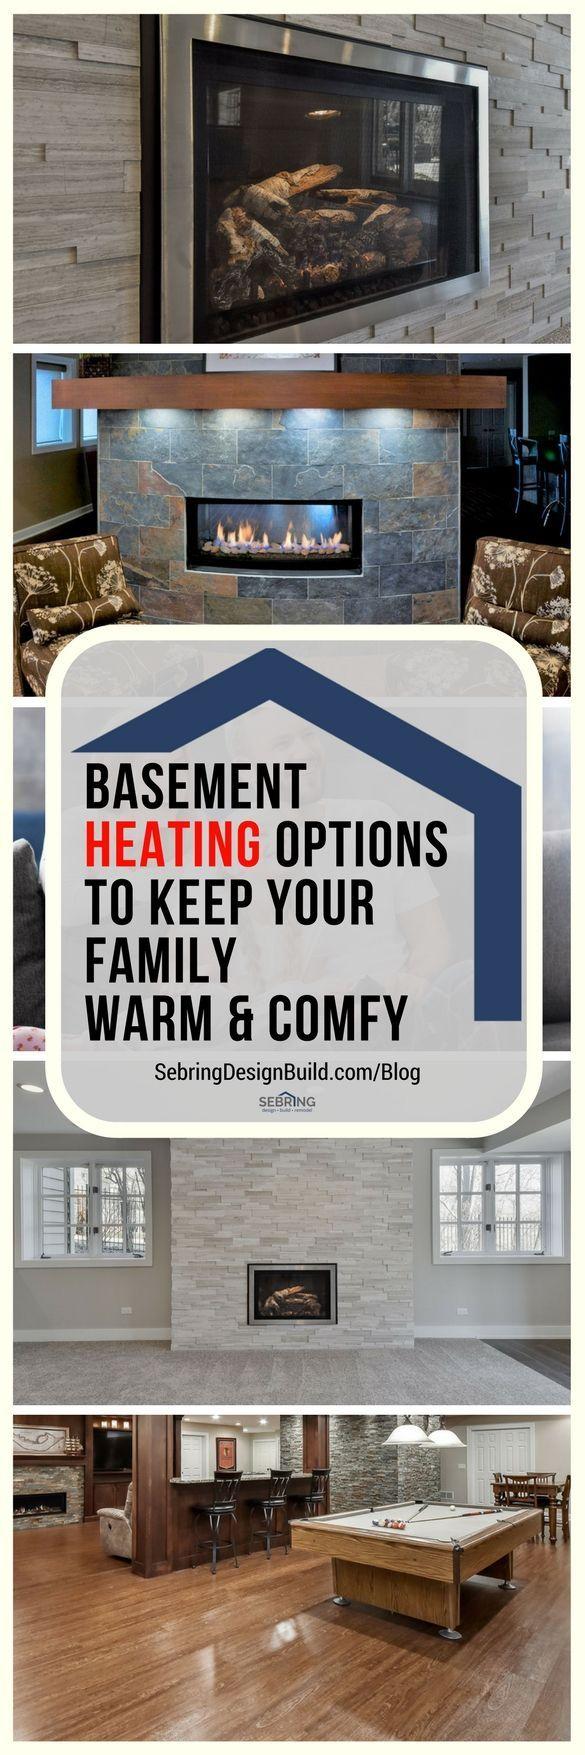 Unique Heating Options for Basement